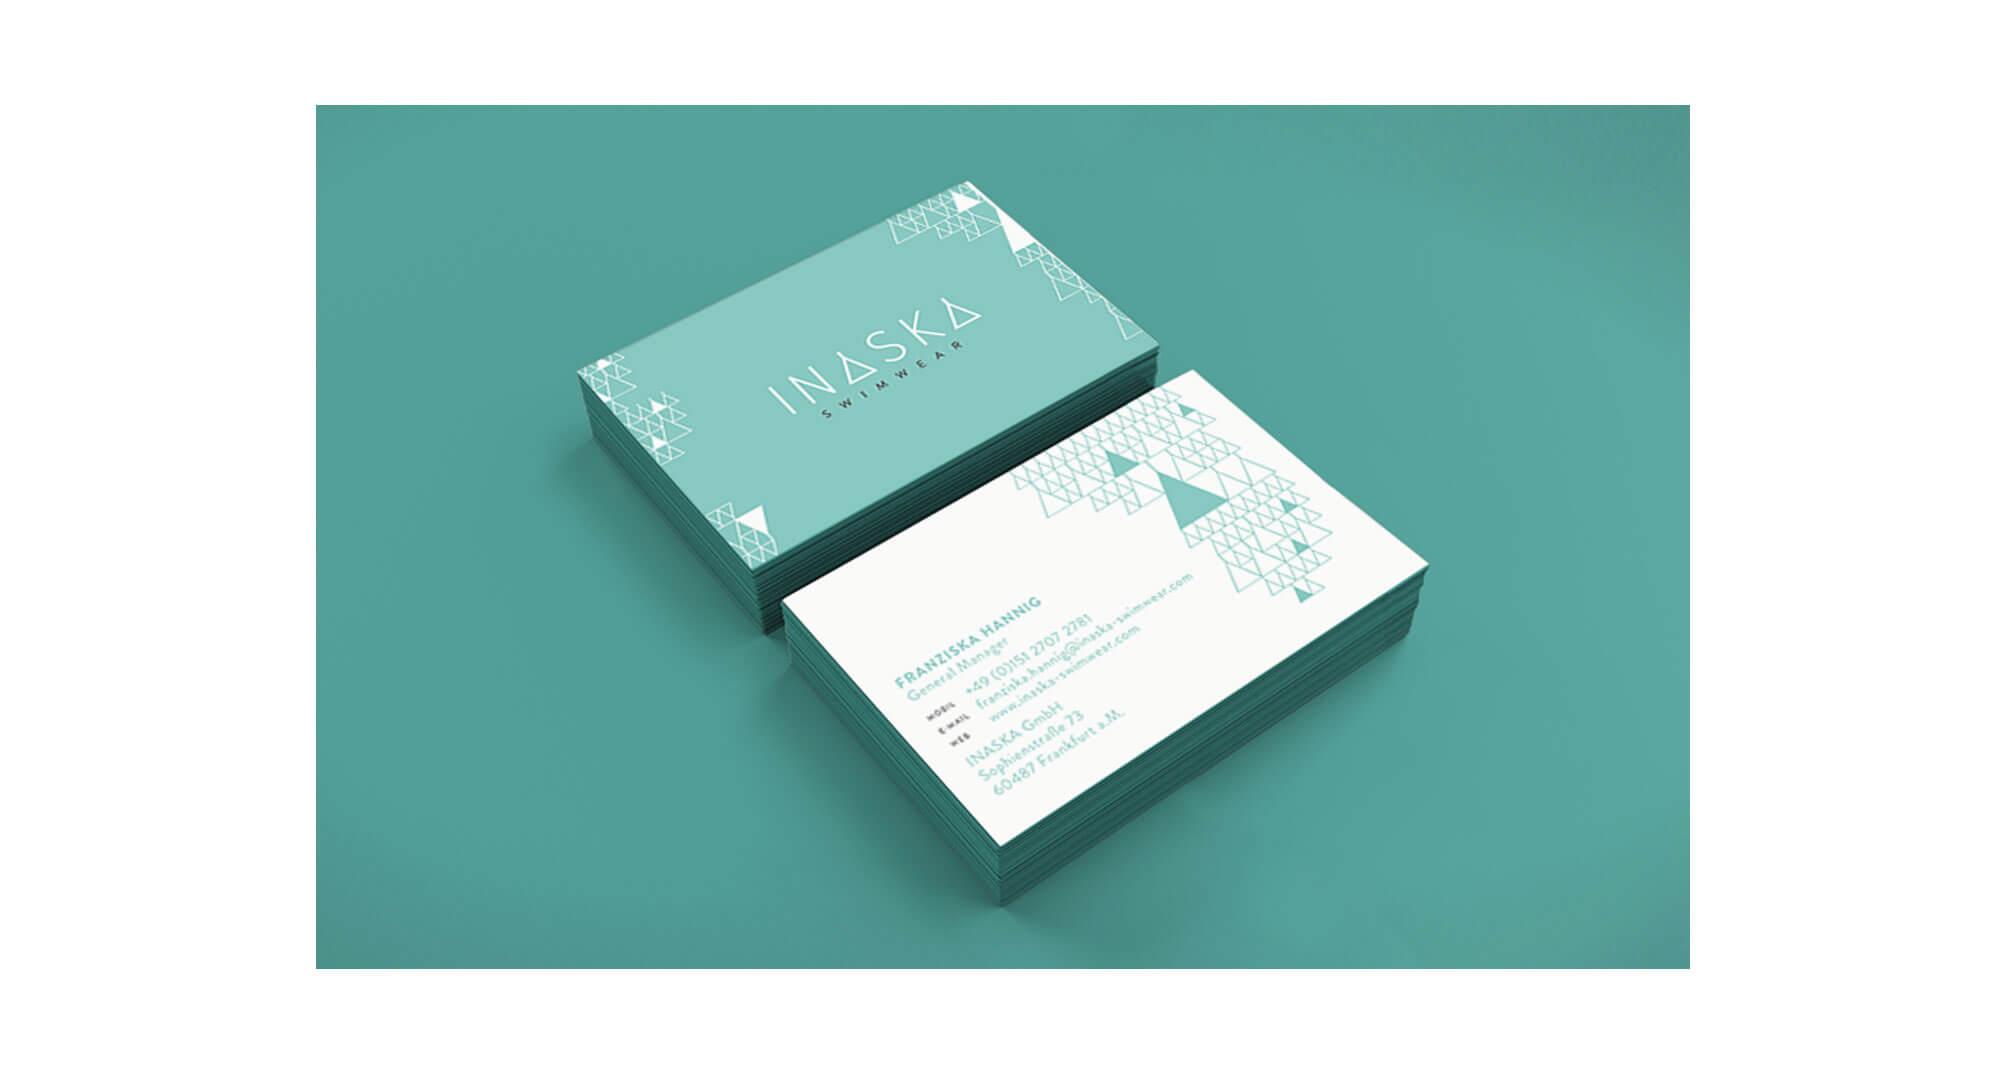 360VIER_Inaska_Case-Study_Slider-05 Inaska Swimwear